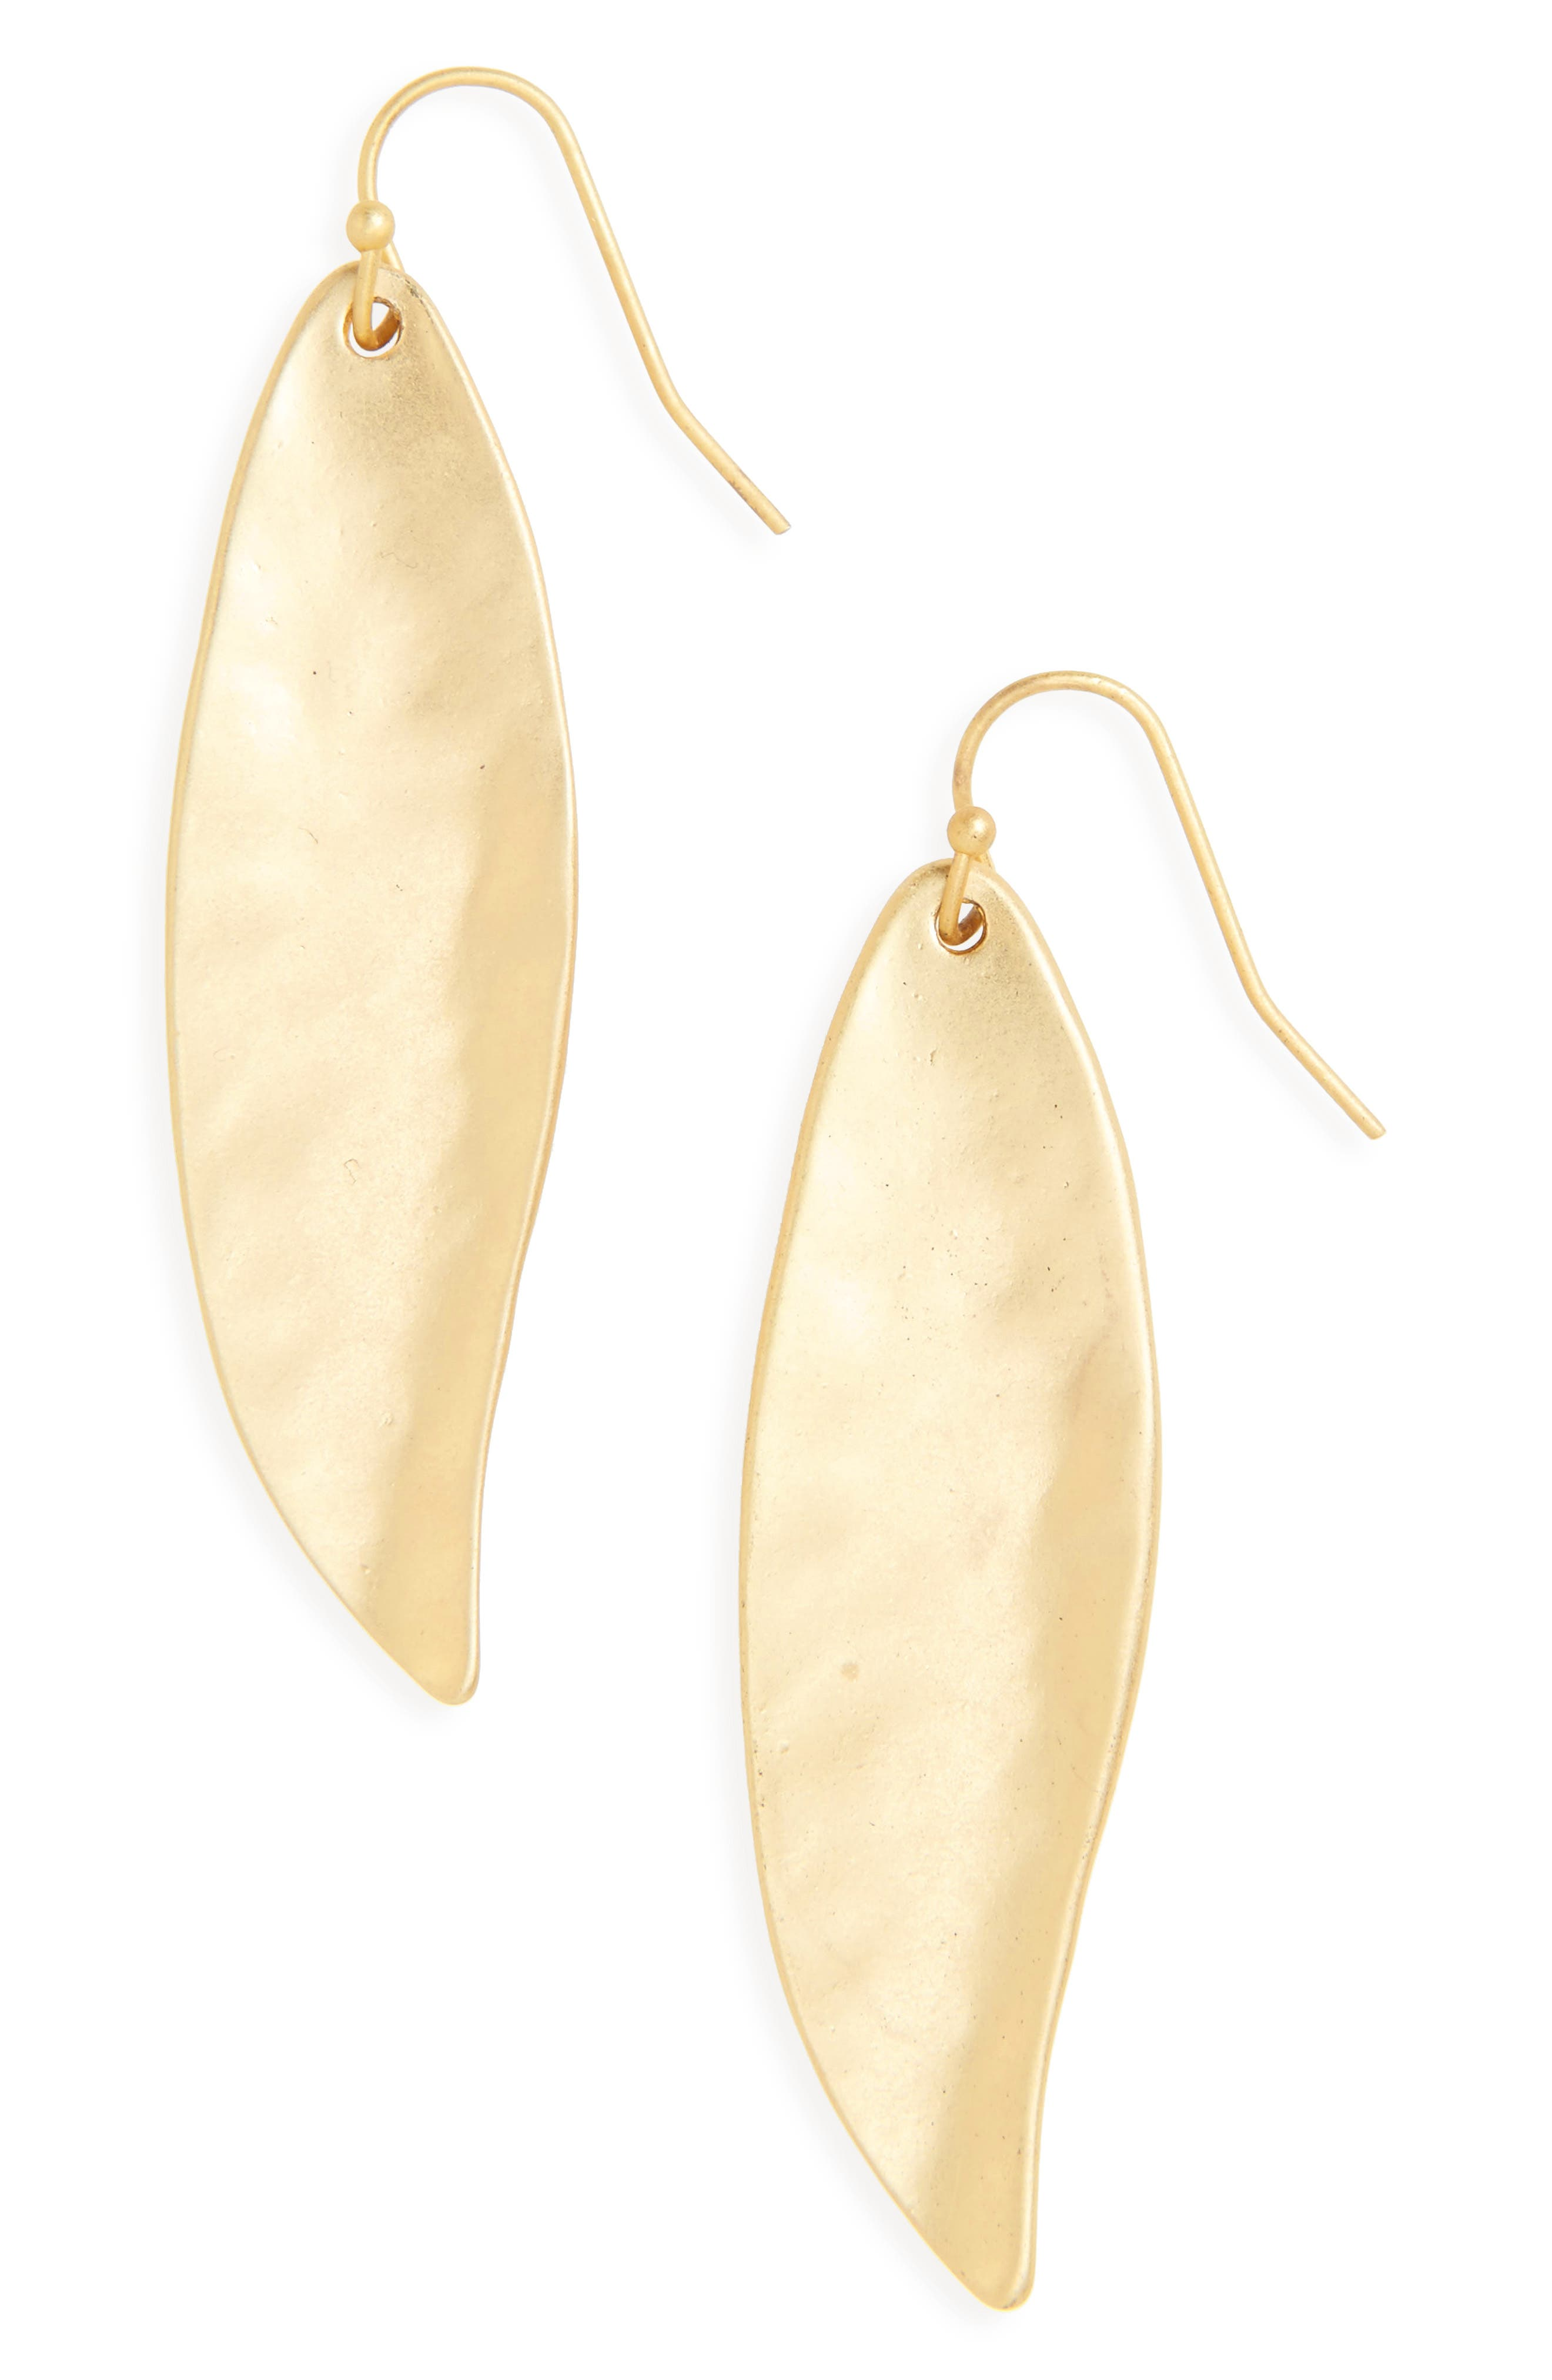 Ellipse Drop Earrings,                             Main thumbnail 1, color,                             Worn Gold